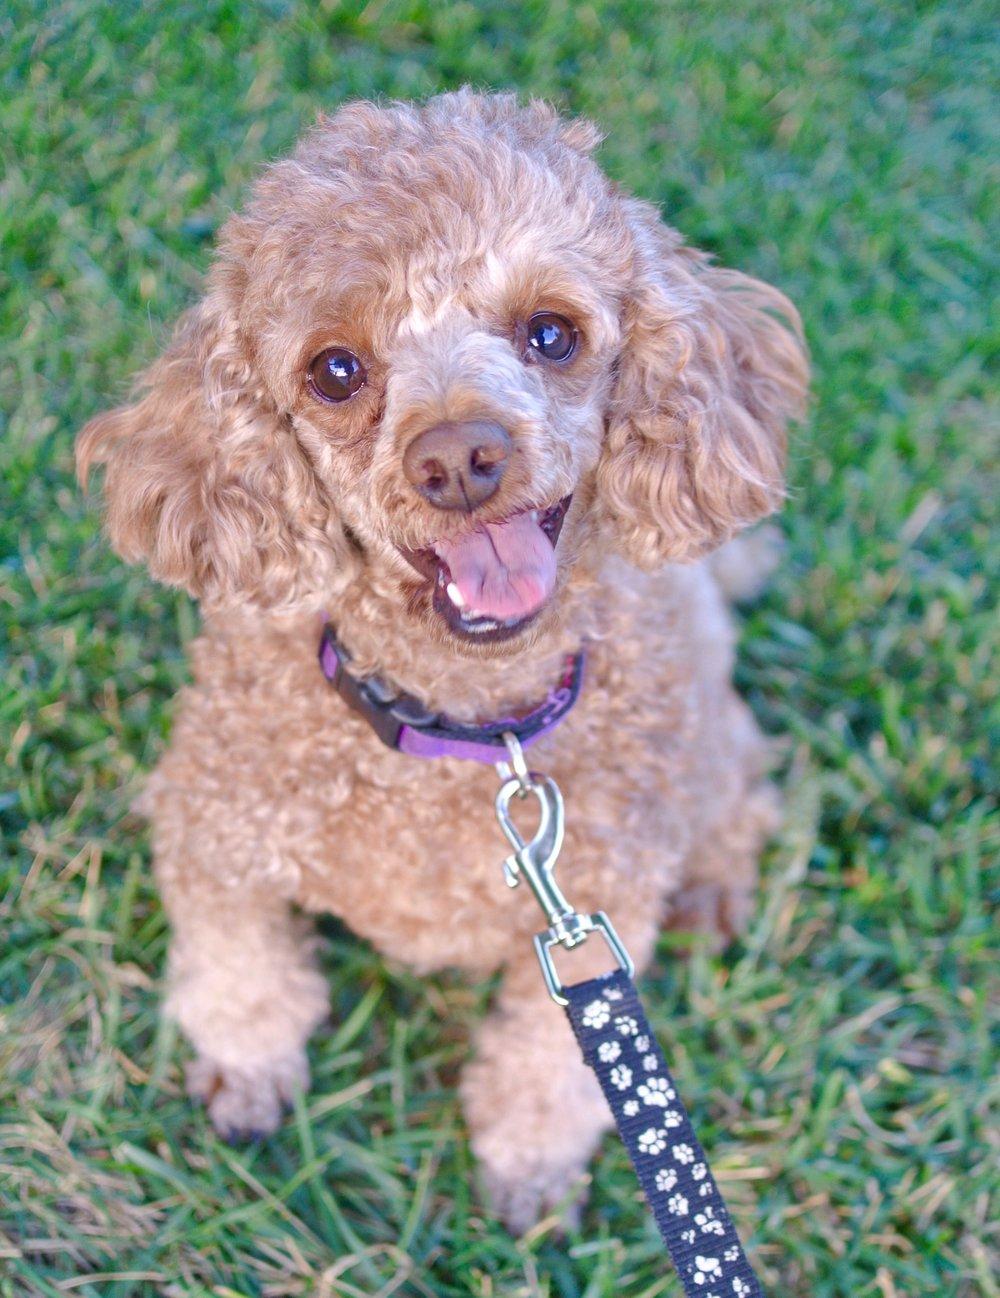 Minnie the poodle so cute 11:12:17.jpg